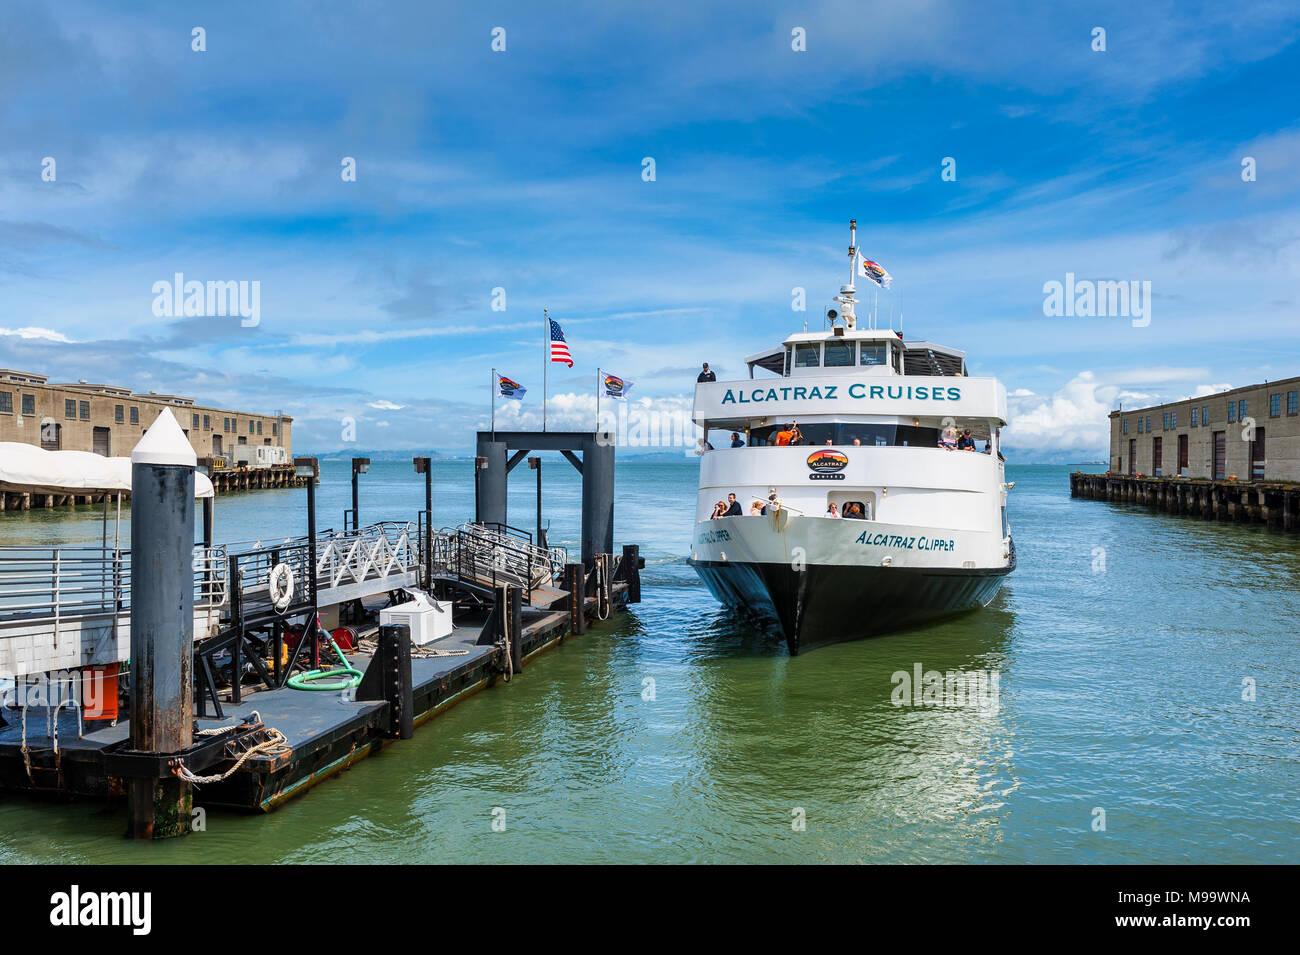 Alcatraz Cruises Ferry in San Francisco Bay California USA - Stock Image